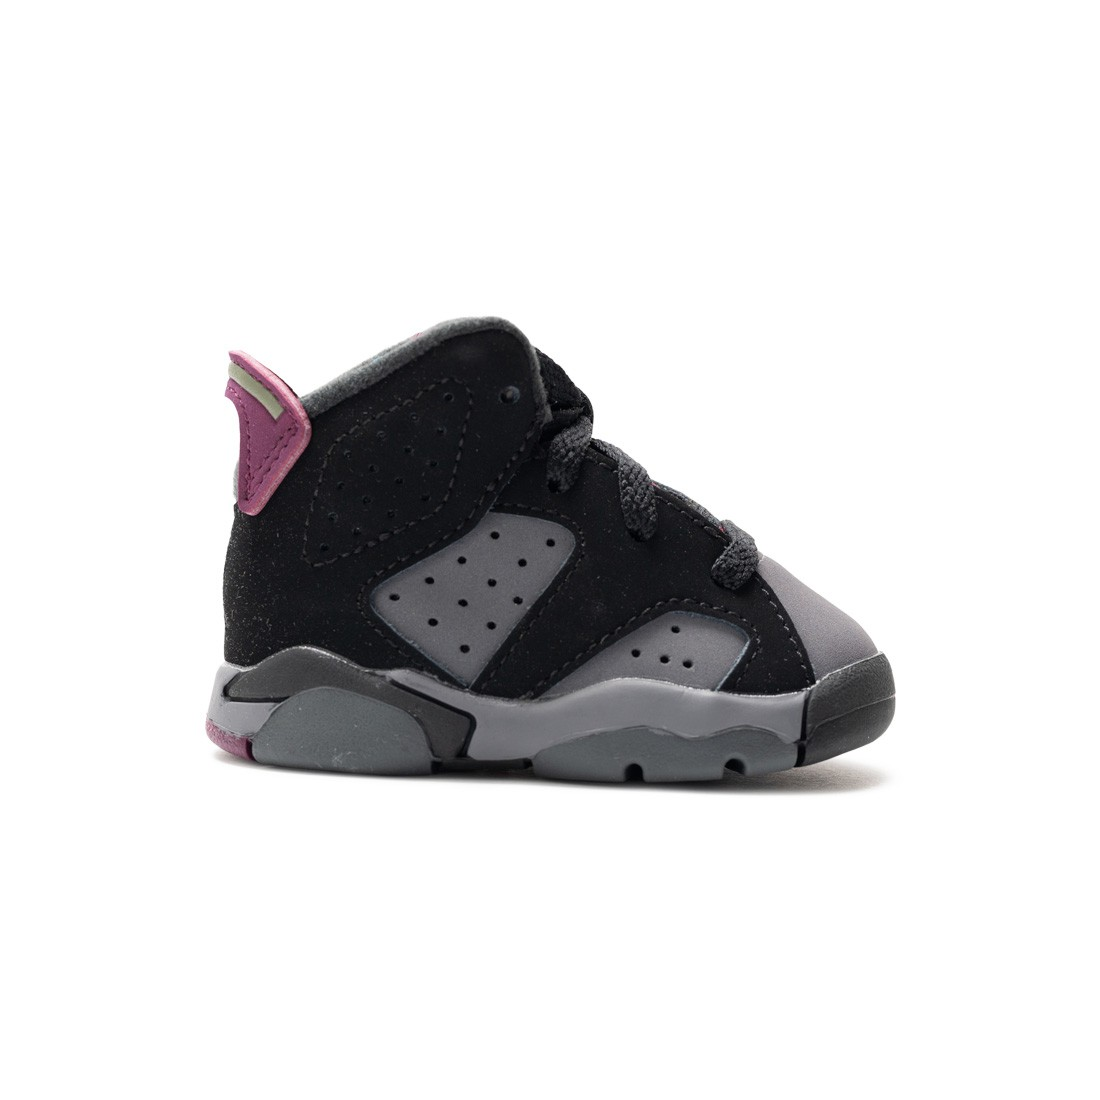 Jordan Toddlers 6 Retro (black / bordeaux-lt graphite-dark grey)